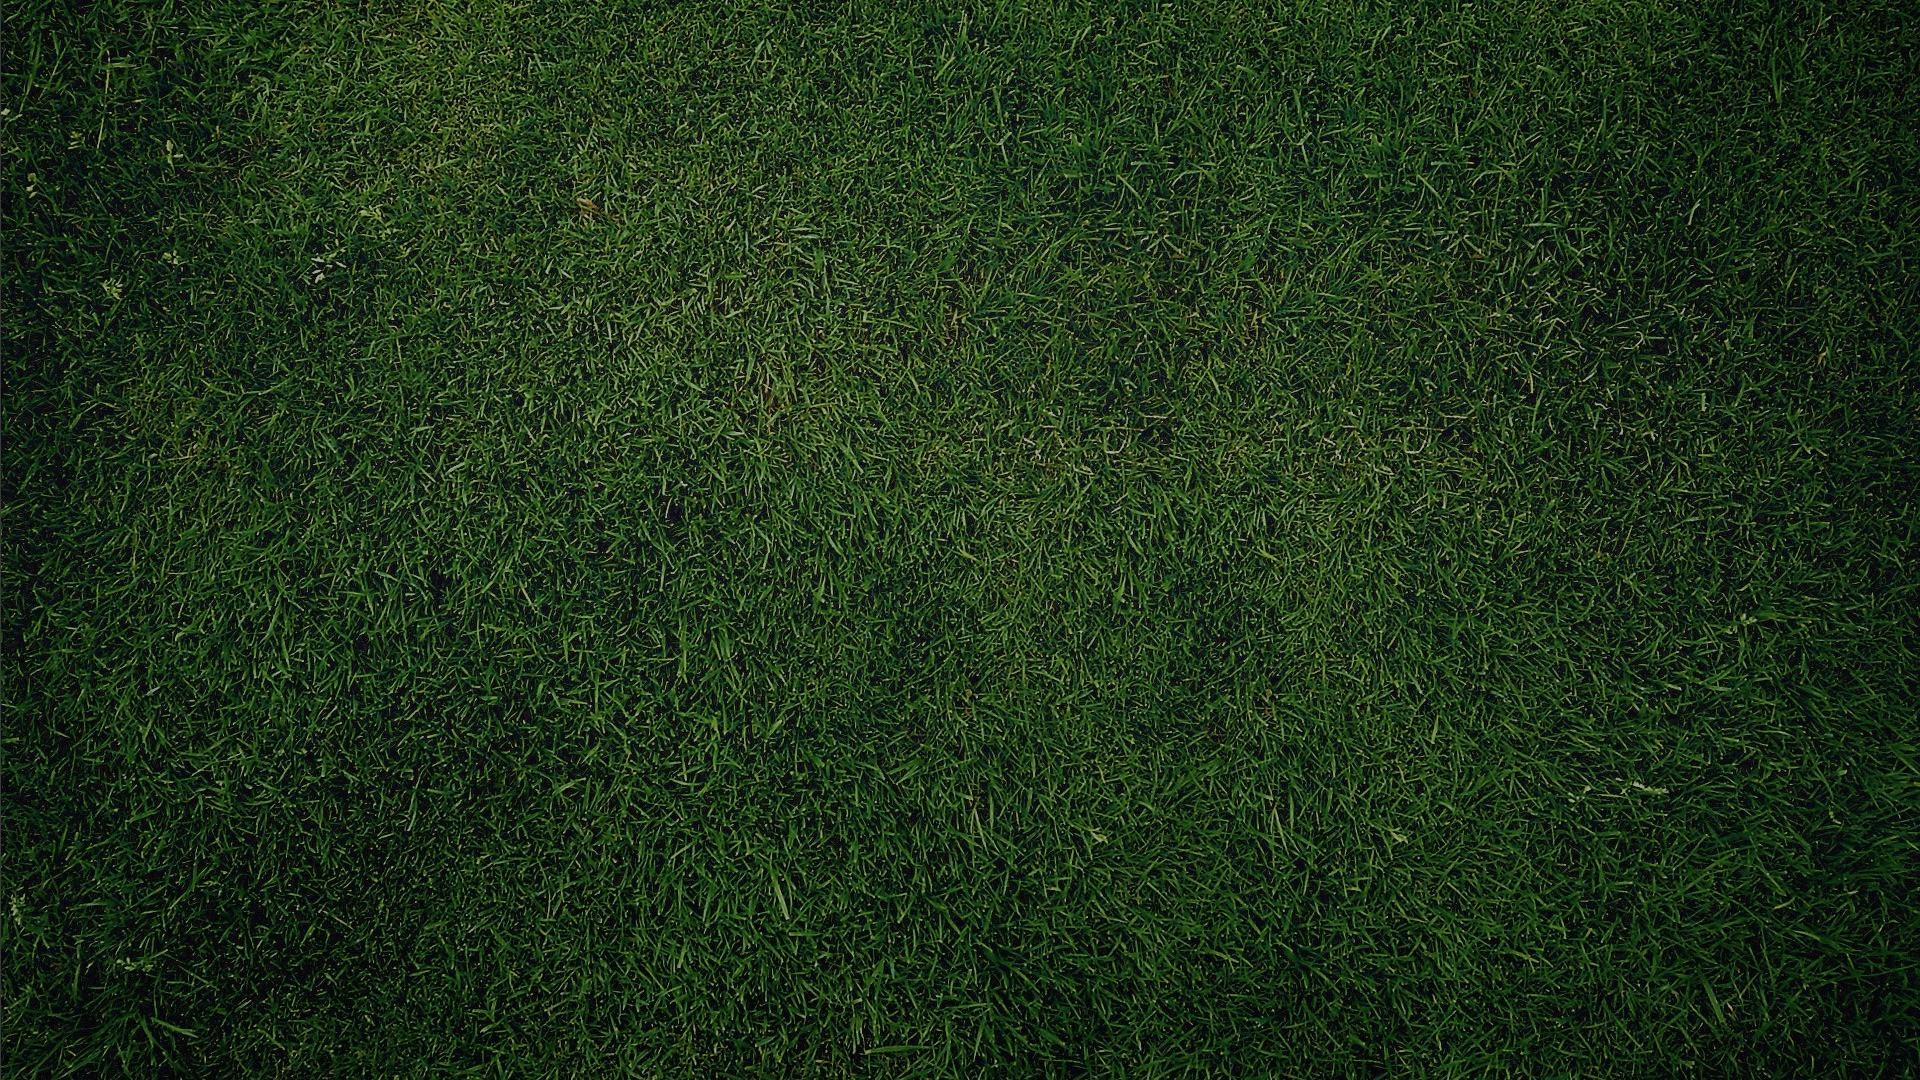 Hd Grass Wallpaper - WallpaperSafari